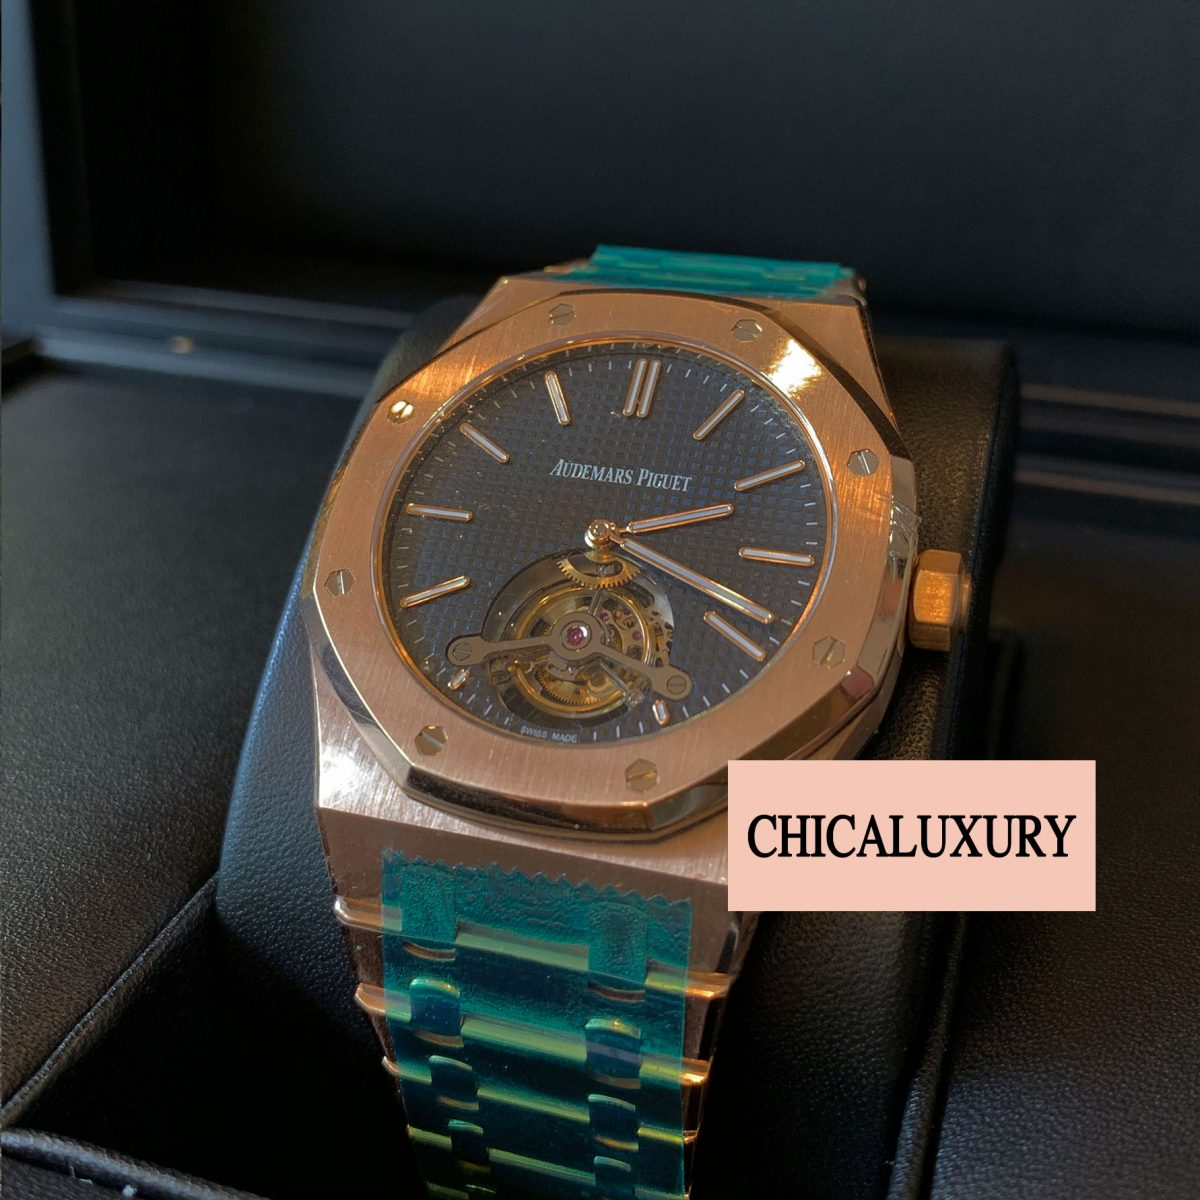 audemars-piguet-royal-oak-tourbillon-extra-thin-pink-gold-26510or-oo-1220or-01-5